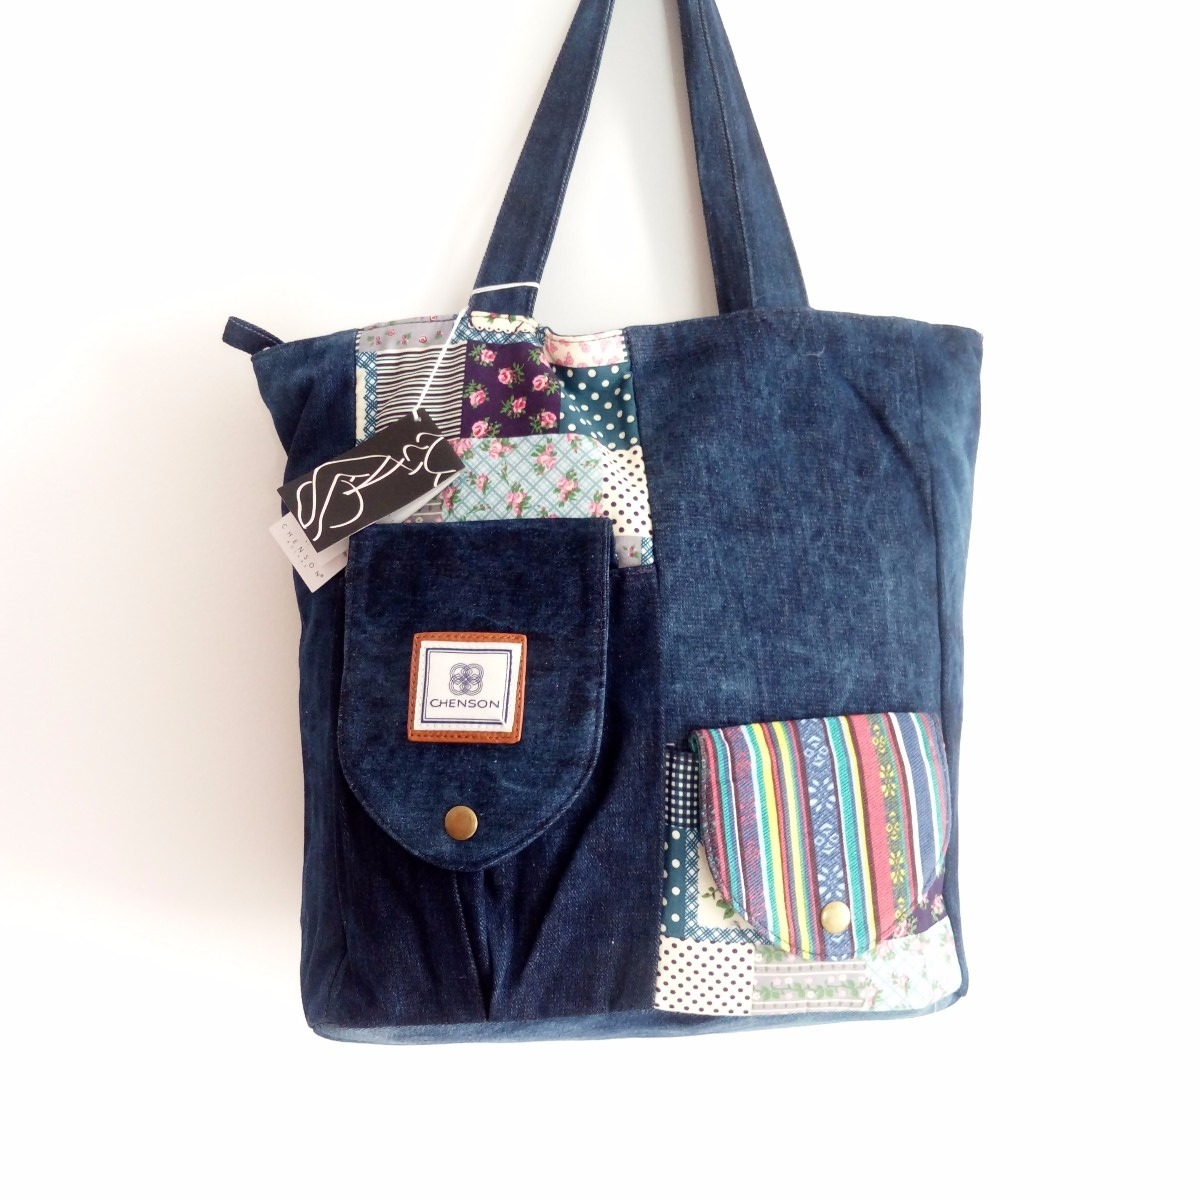 fbeeaec79 Bolsa Feminina Sacola Jeans Importada Cg69628 - R$ 330,00 em Mercado ...